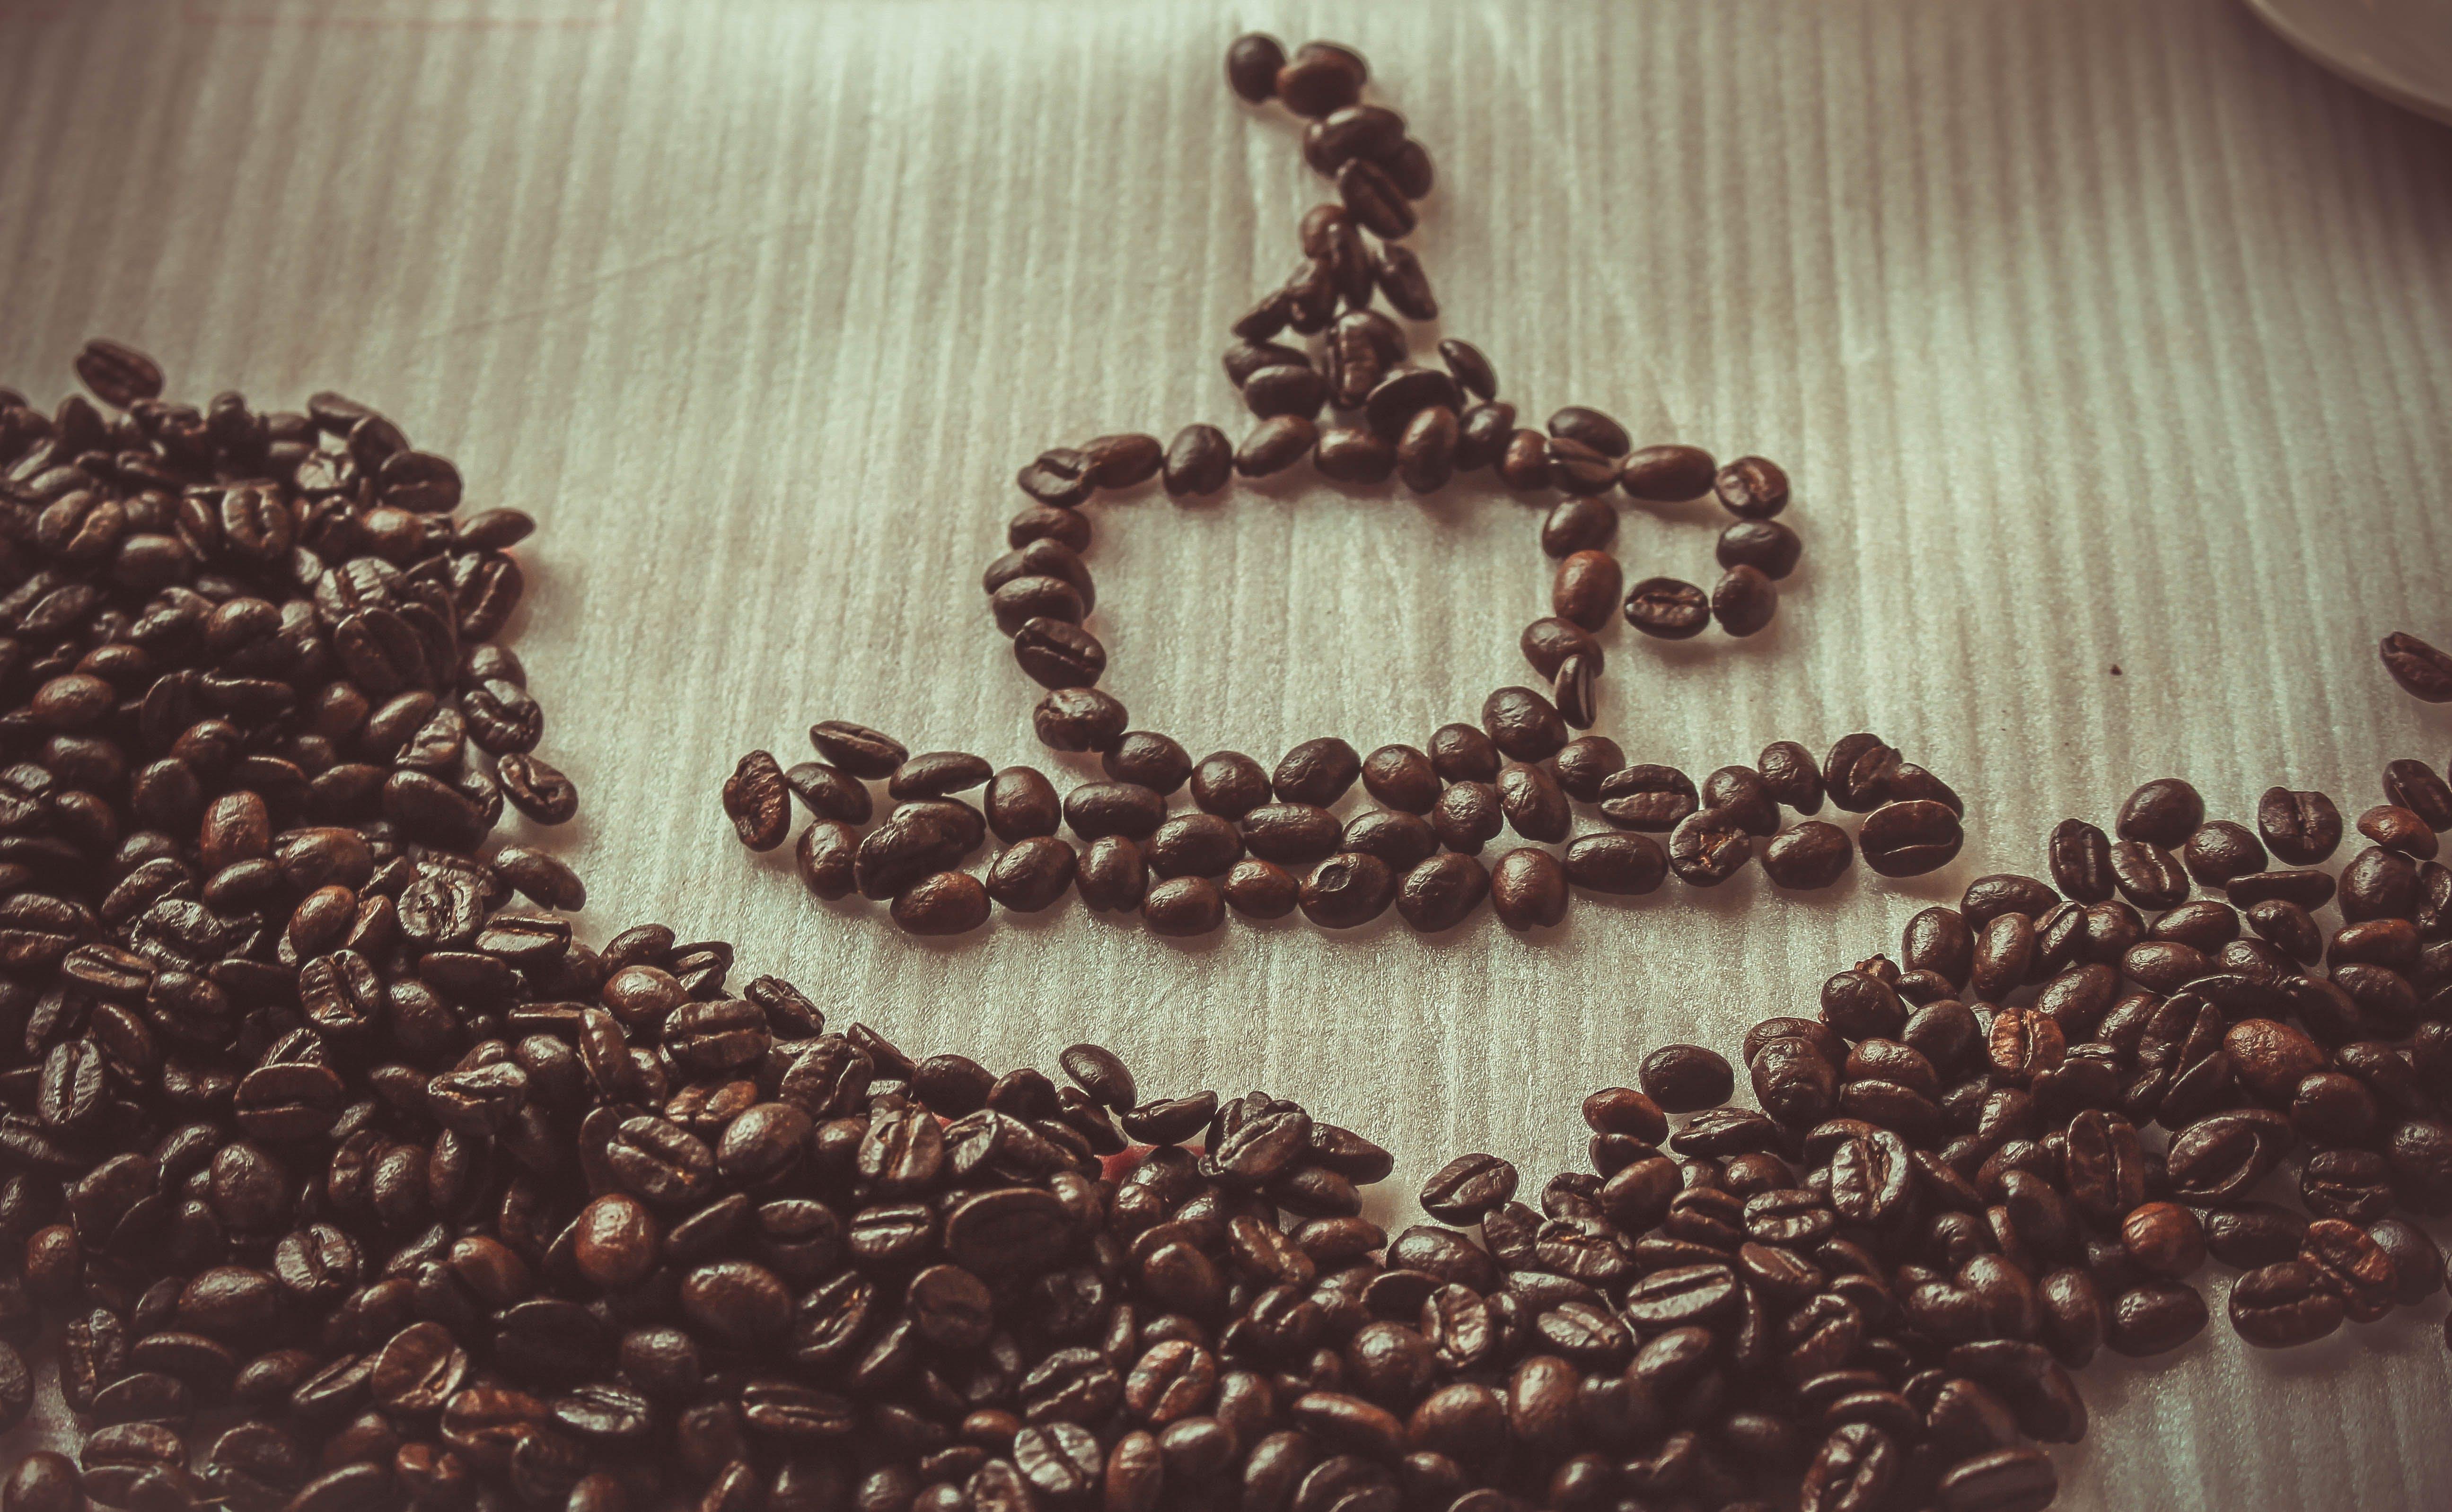 Brown Coffee Bean Forming Coffee Mug